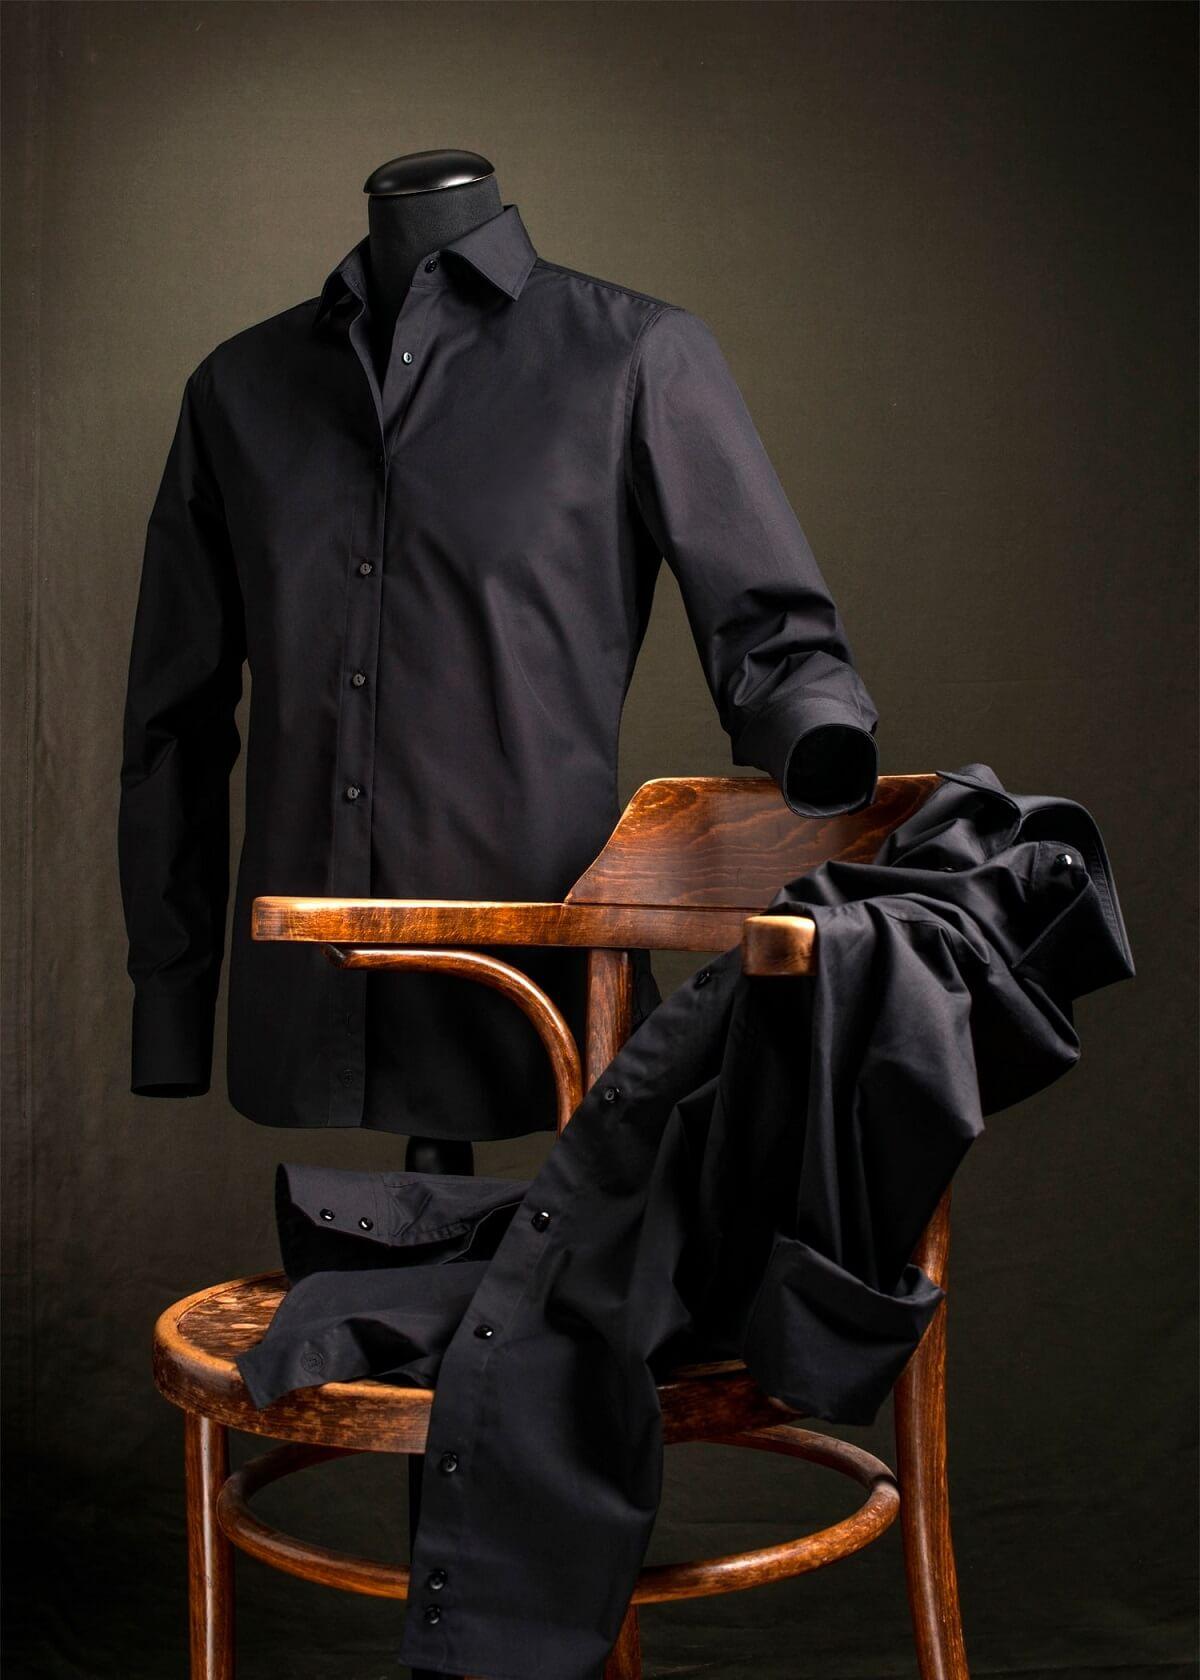 Zwart Overhemd We.Zwart Overhemd Slim Fit Klassiek Van Cees N Co